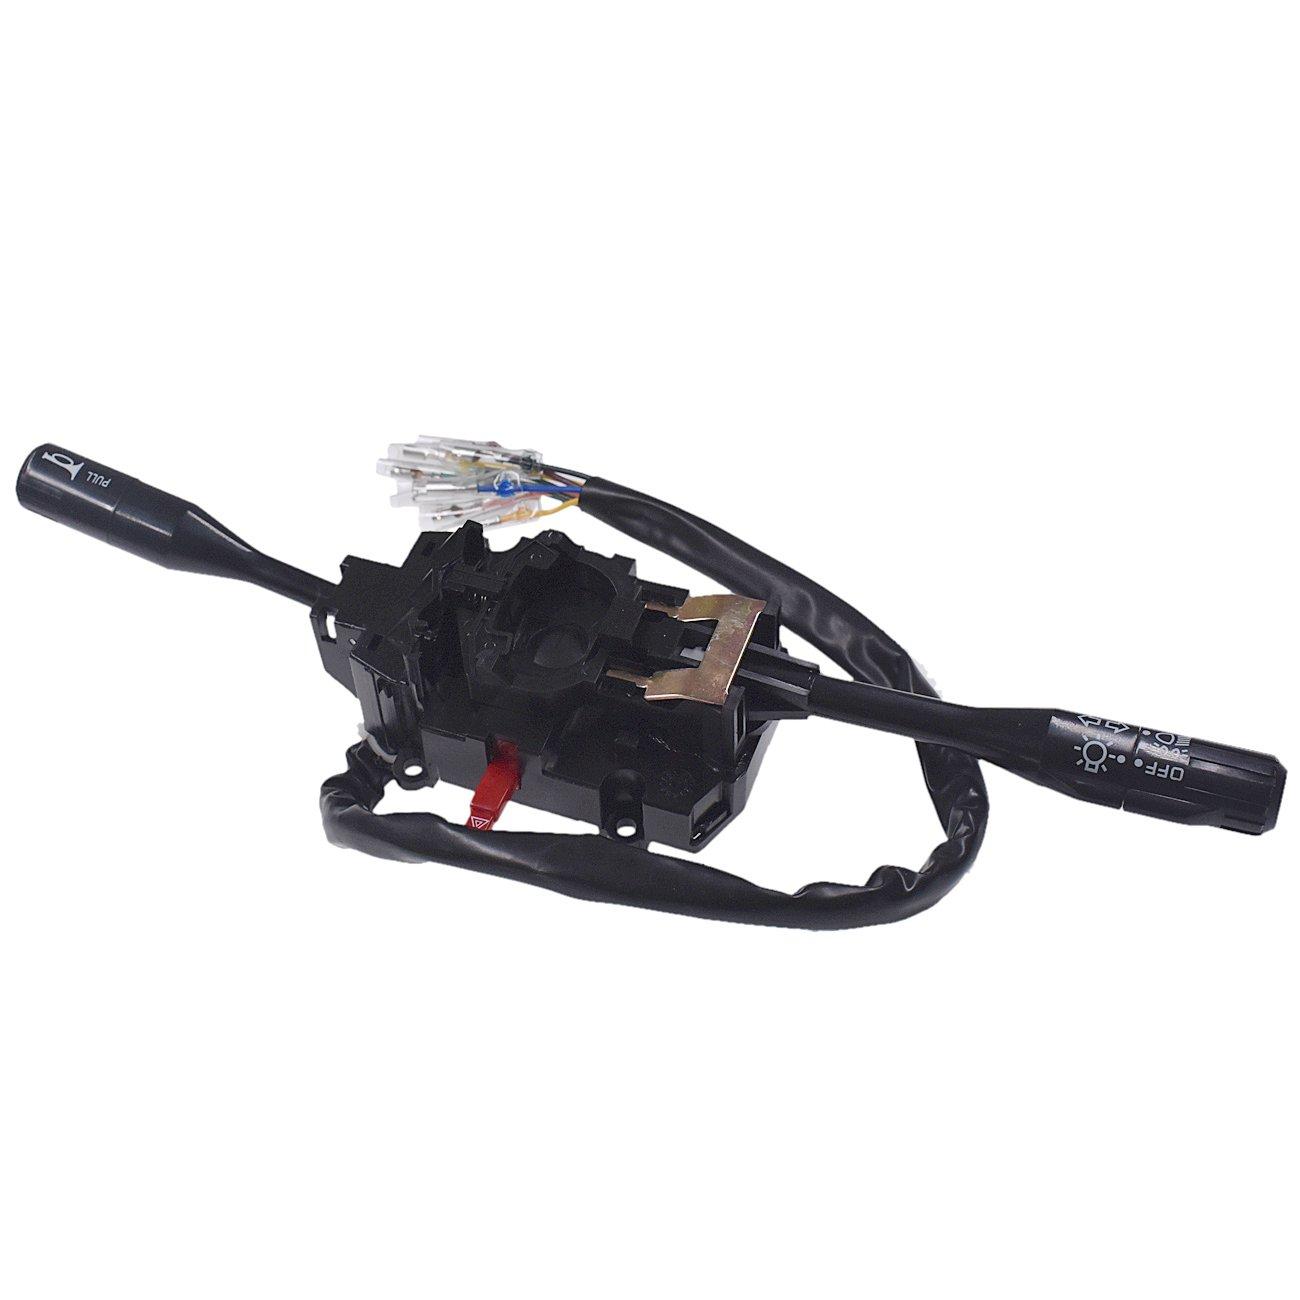 JRL UTV 700 500 Light Switch Turn Signal Horn for MSU 400 800 Massimo SUPERMACH Huang Machinery